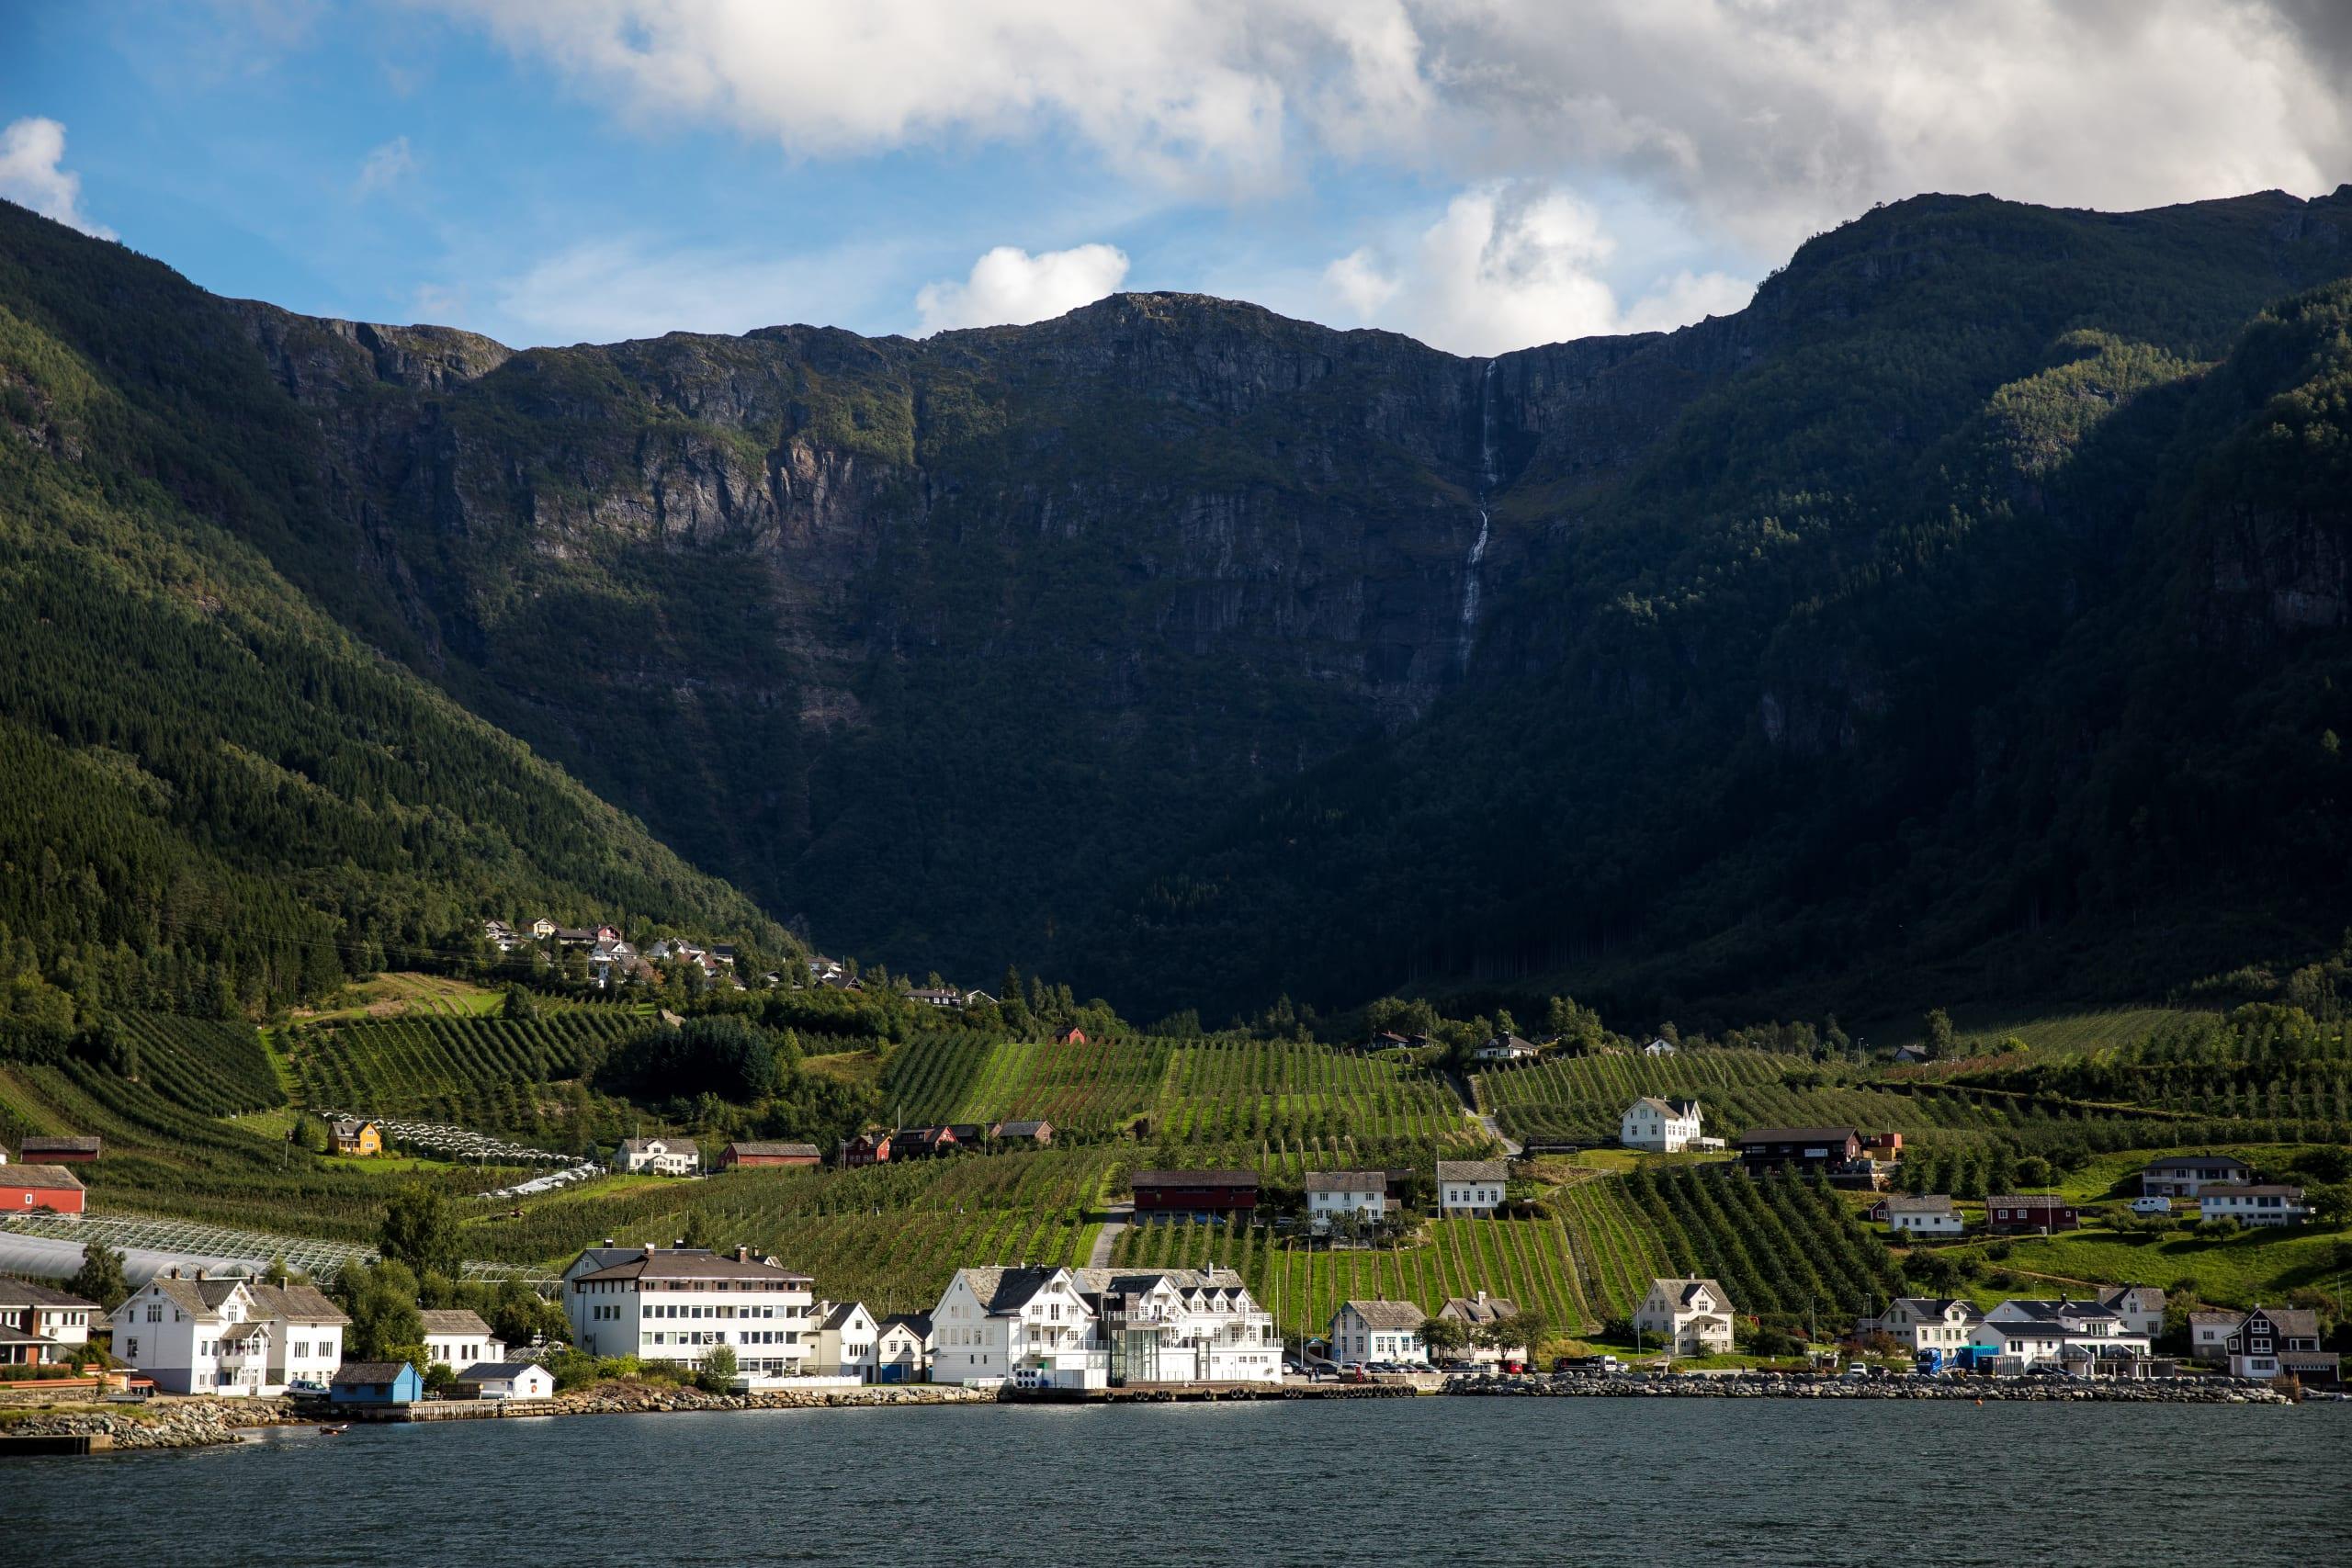 Fjord village along the Hardangerfjord